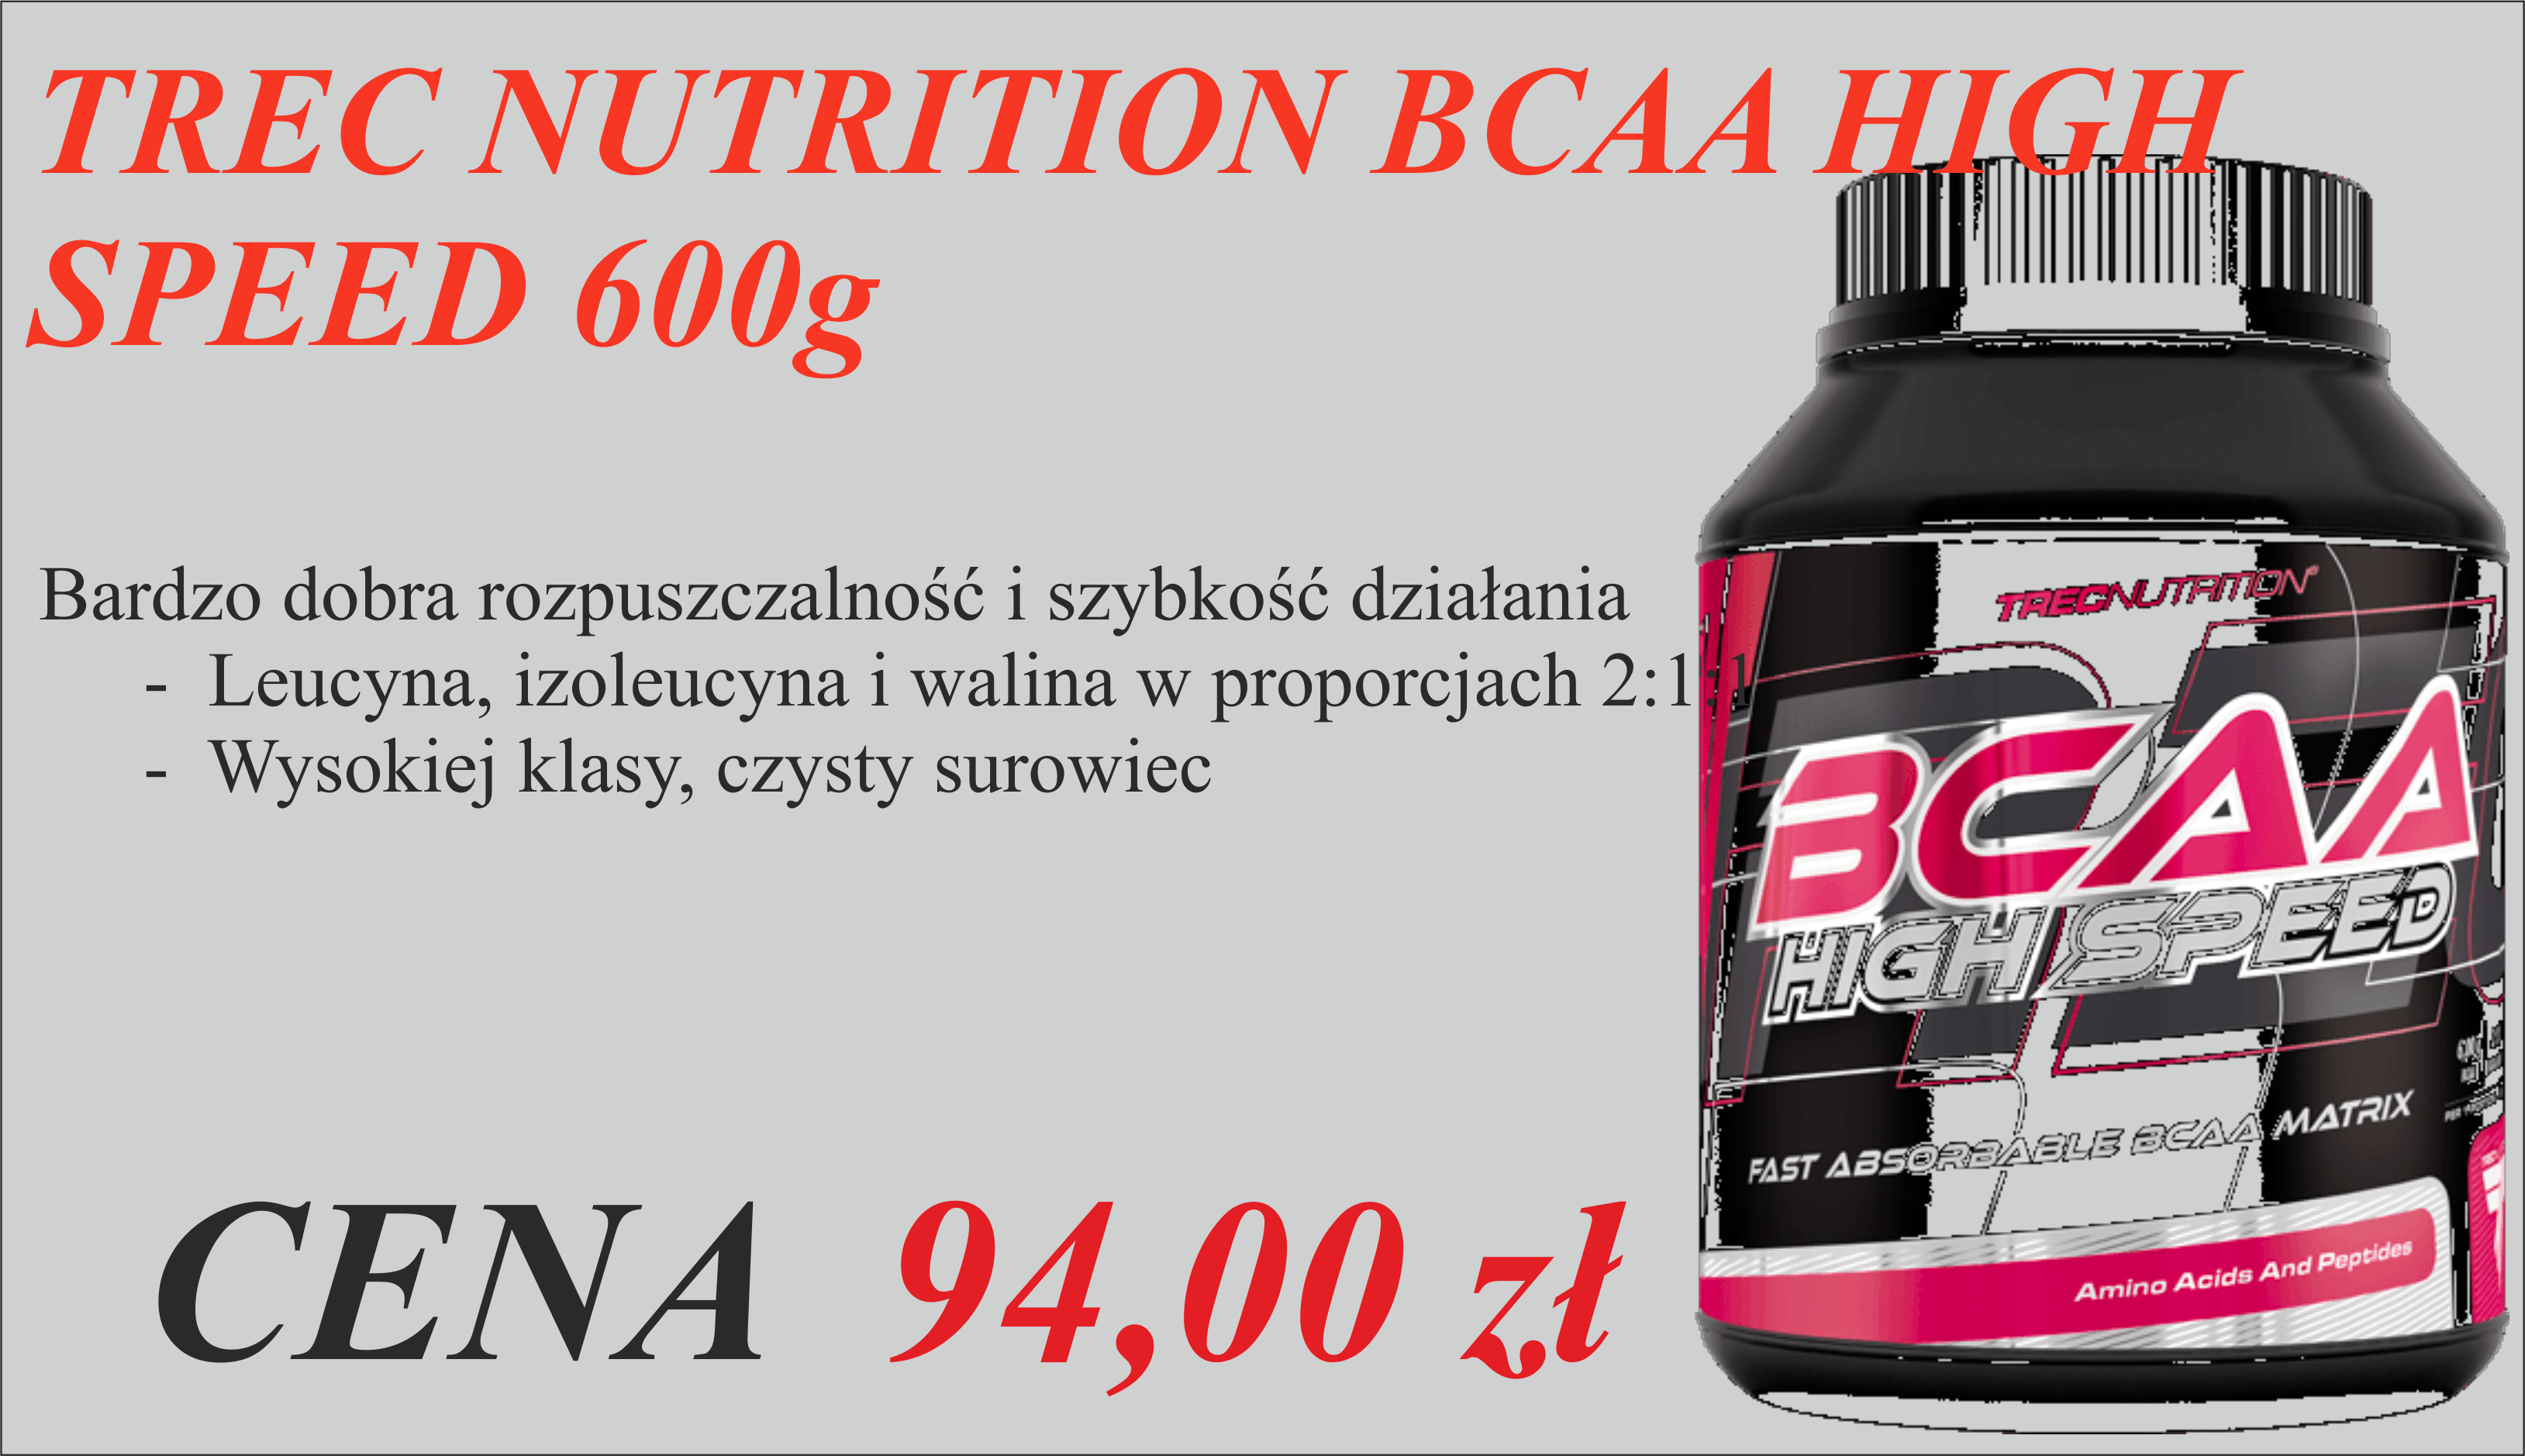 TREC NUTRITION BCAA